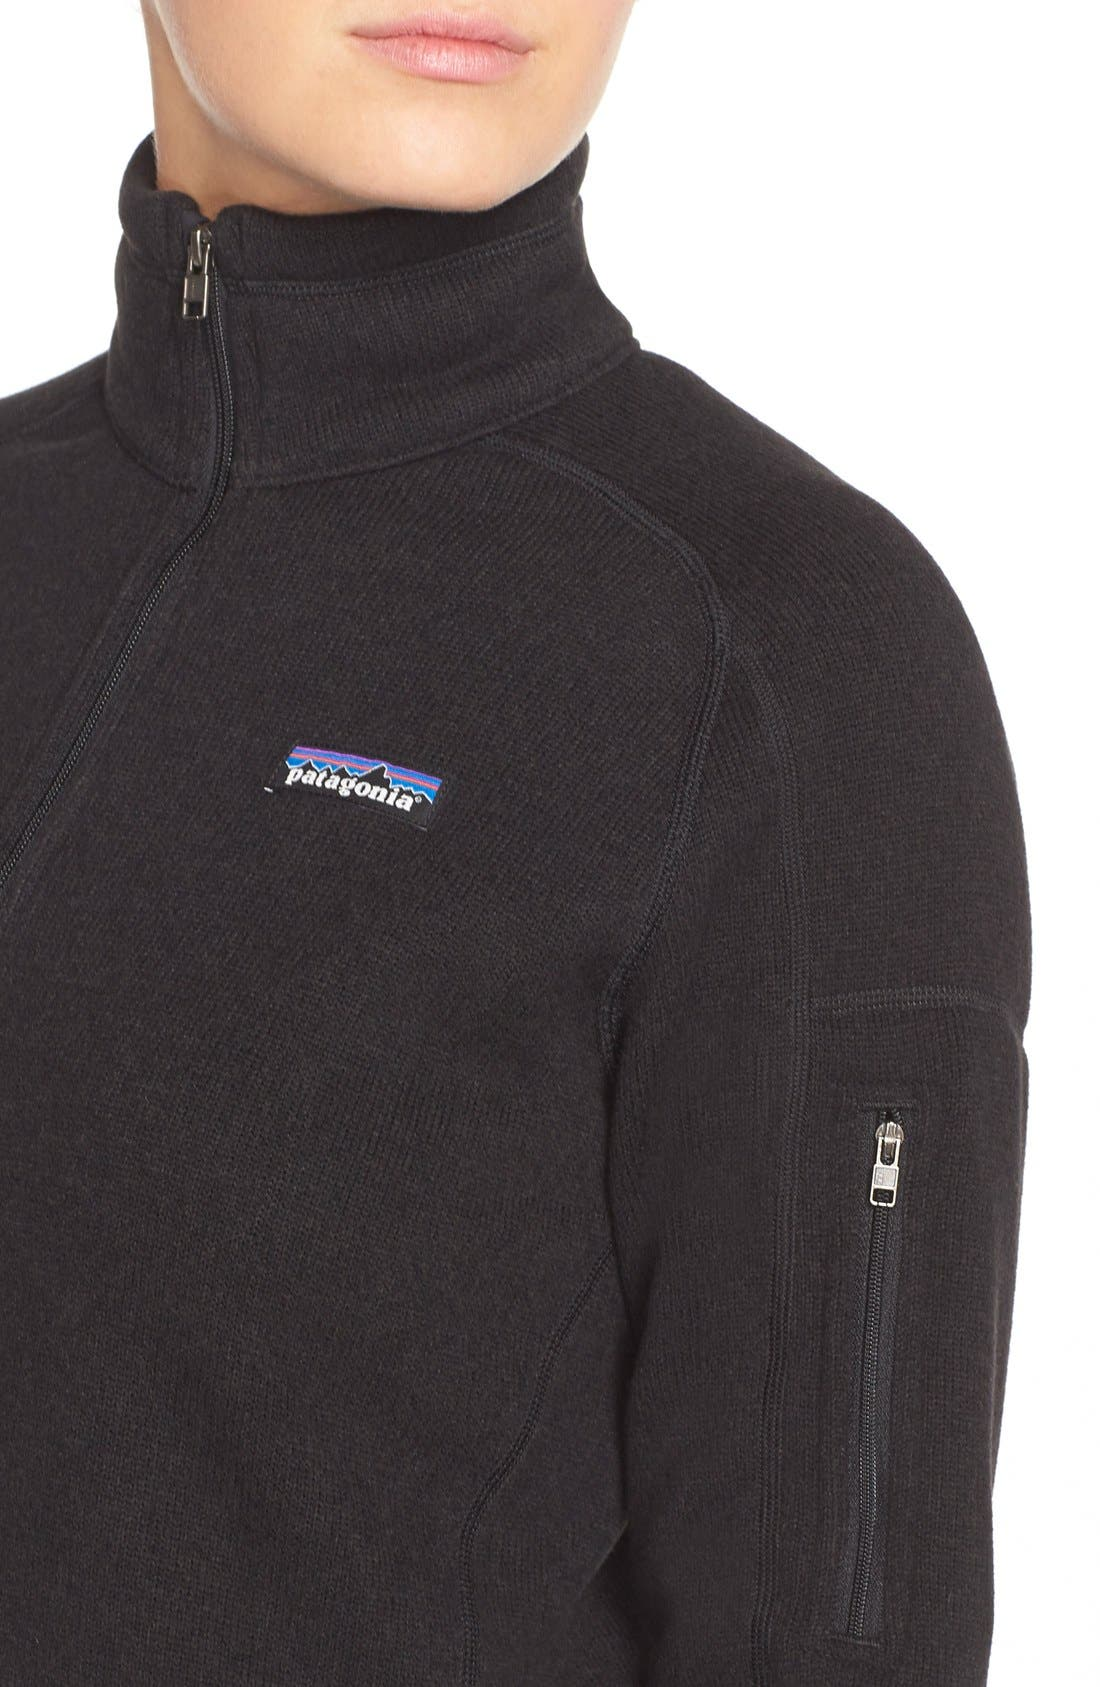 Better Sweater Zip Pullover,                             Alternate thumbnail 2, color,                             001